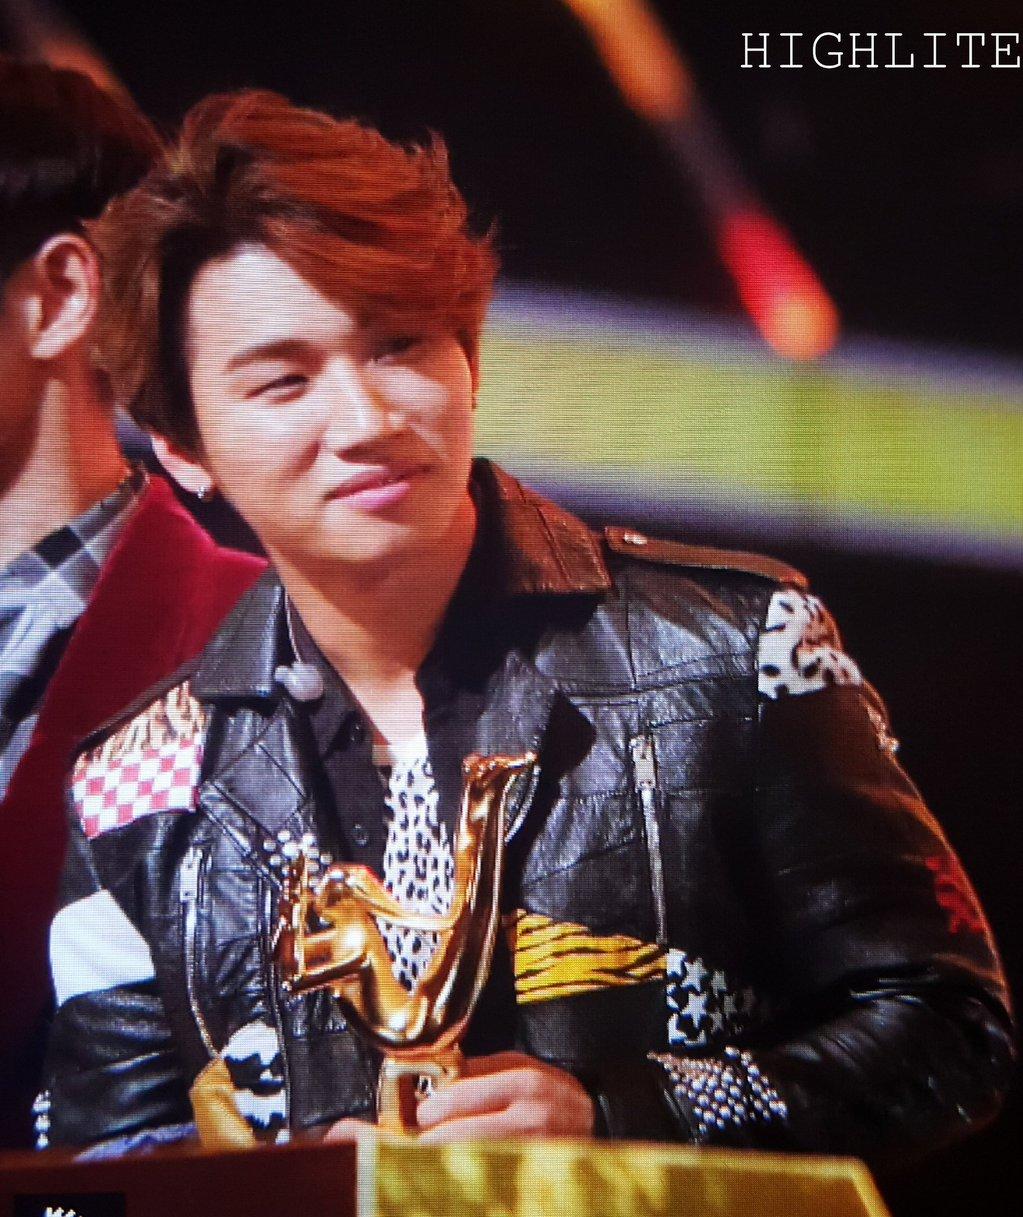 BIGBANG - Golden Disk Awards - 20jan2016 - High Lite - 05